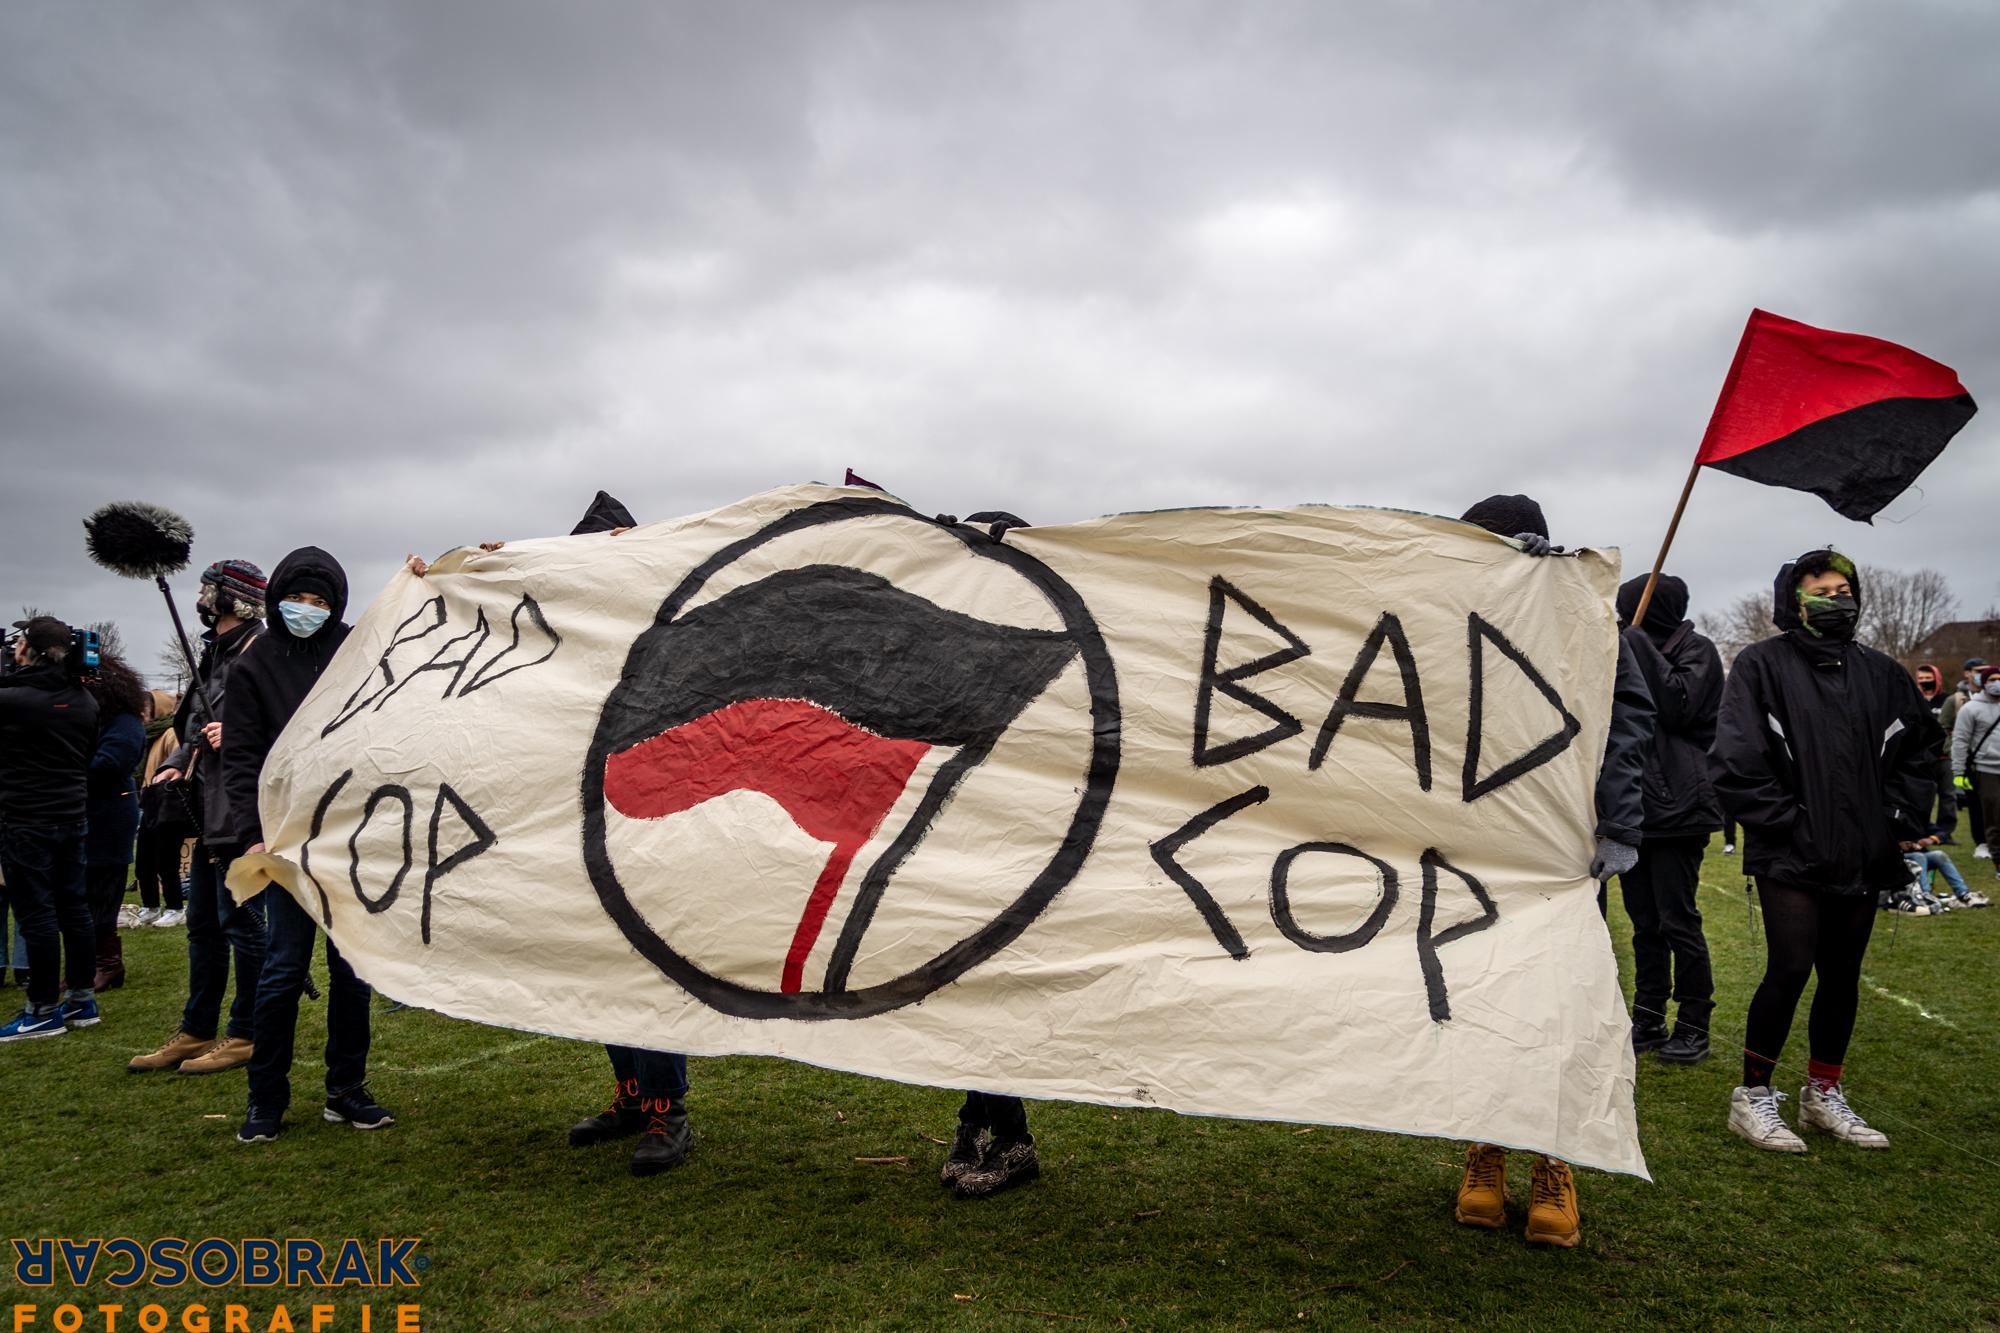 landelijke racisme demo oscar brak fotografie